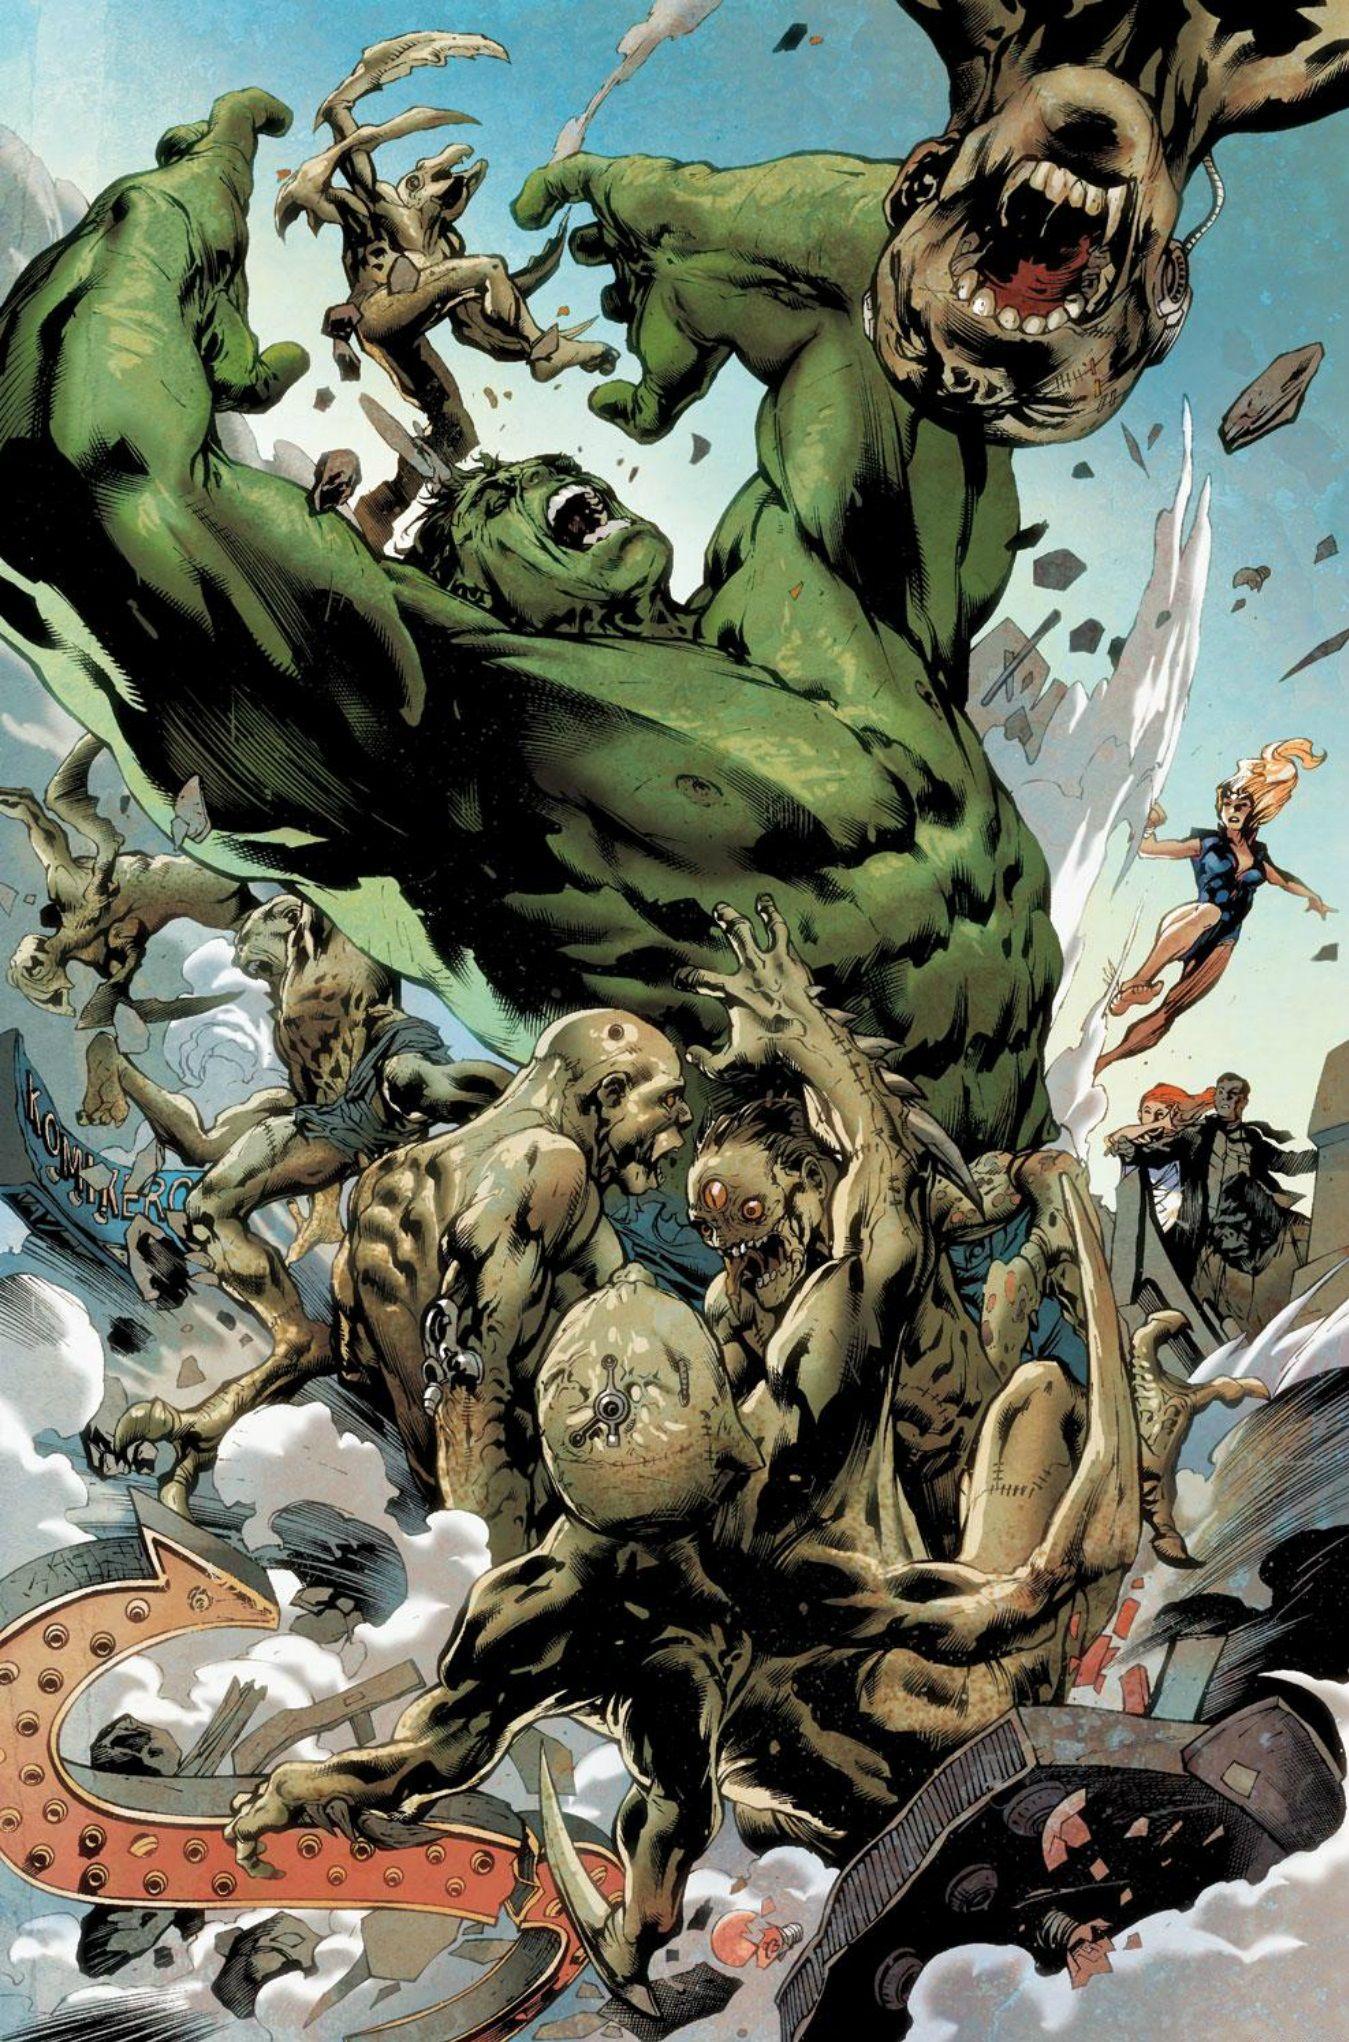 #Hulk #Fan #Art. (Hulk) By: Carlo Pagulayan. ÅWESOMENESS!!!™ ÅÅÅ+ (NO RED MARVEL BANNER BELOW)